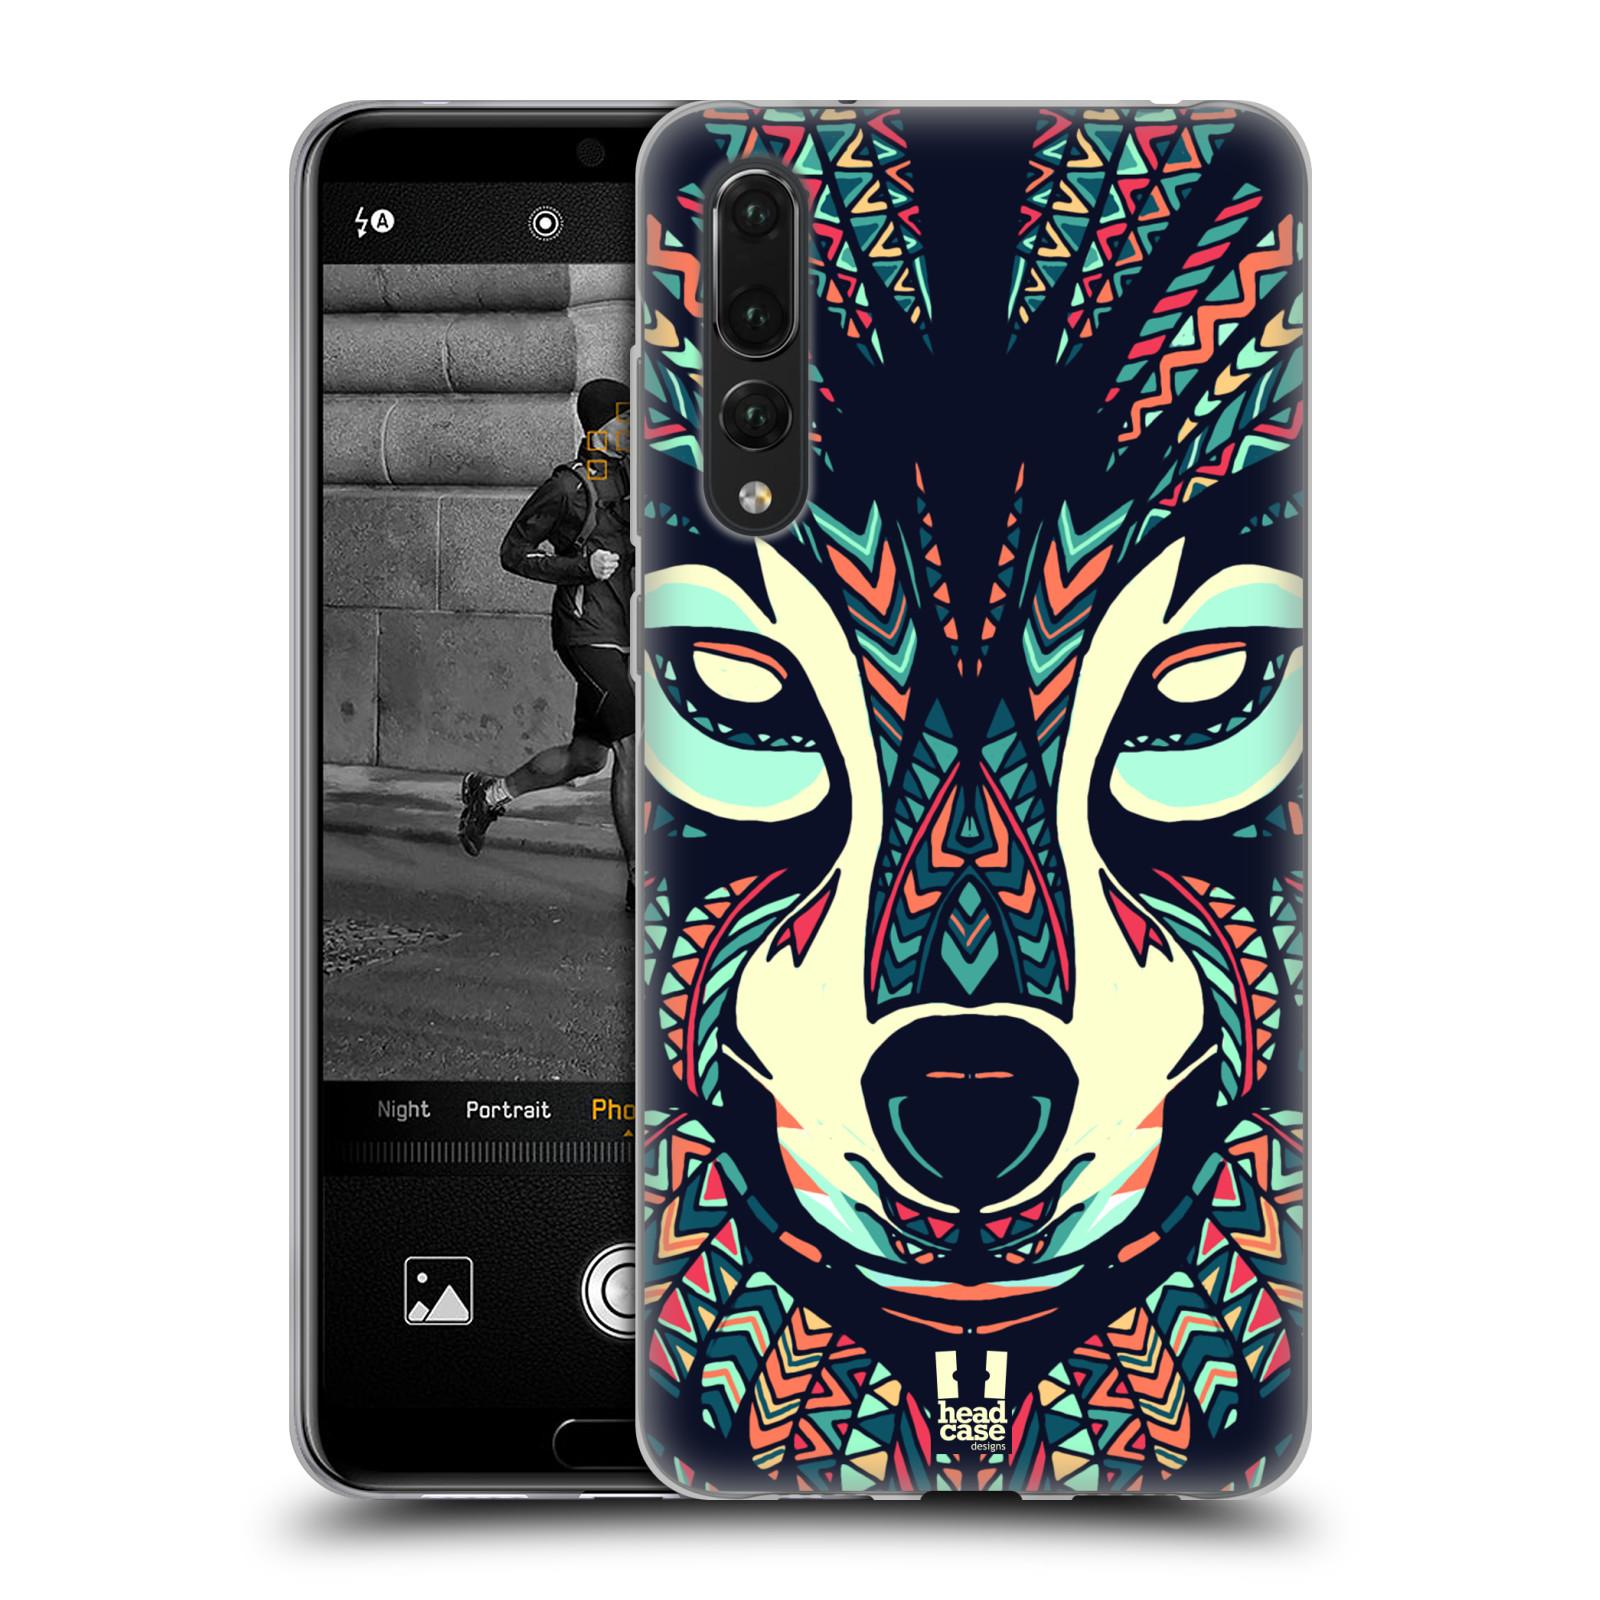 Silikonové pouzdro na mobil Huawei P20 Pro - Head Case - AZTEC VLK (Silikonový kryt či obal na mobilní telefon Huawei P20 Pro Dual SIM s motivem AZTEC VLK)